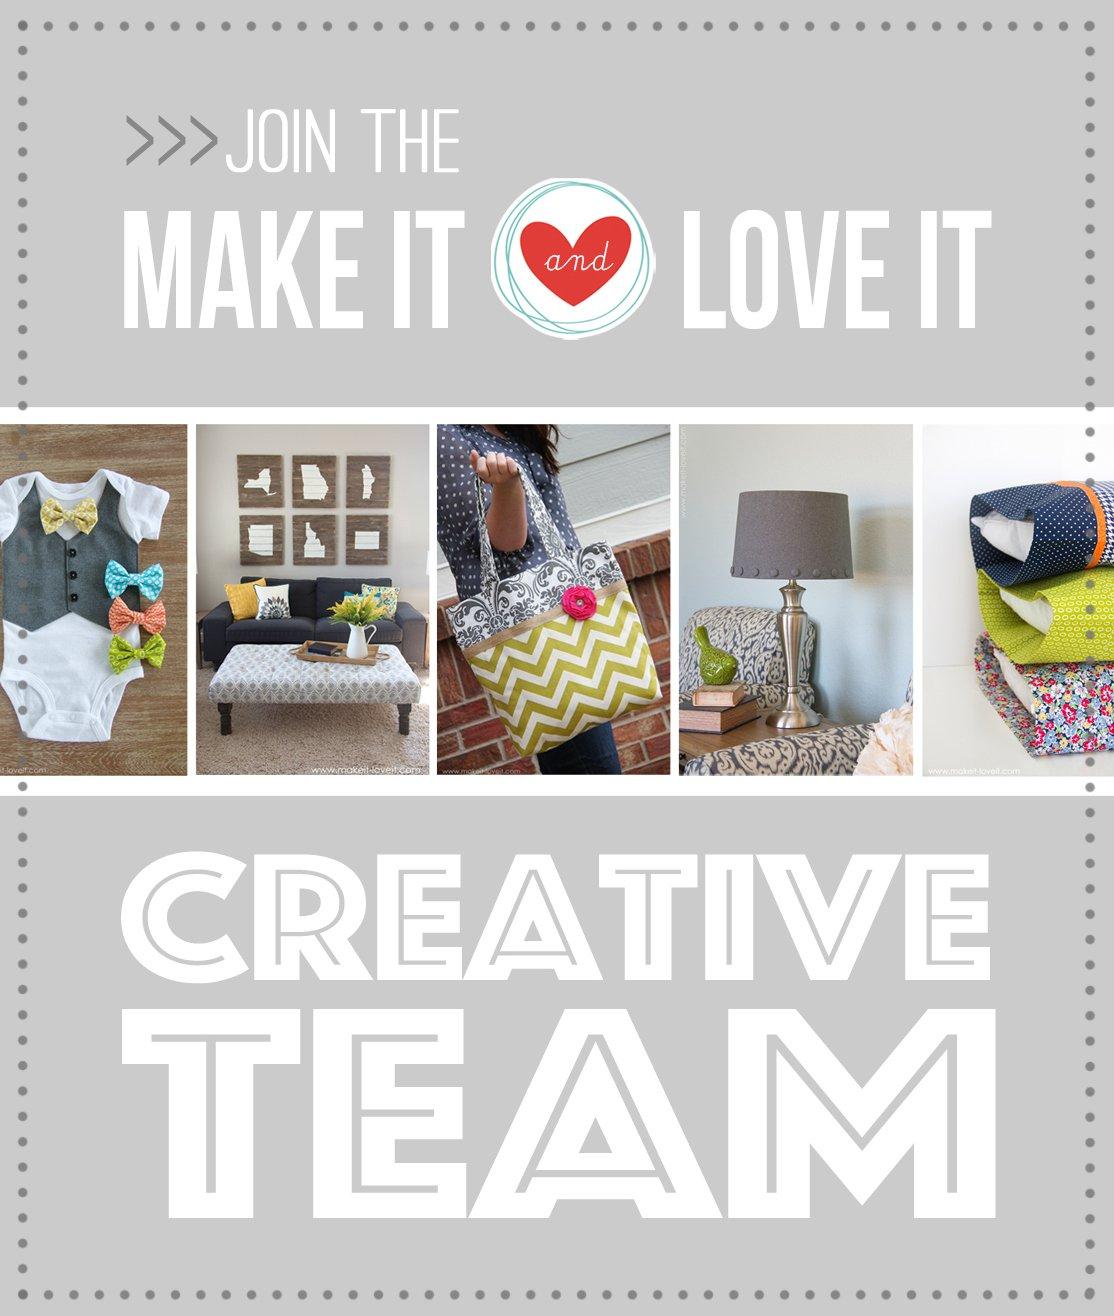 creative team.4